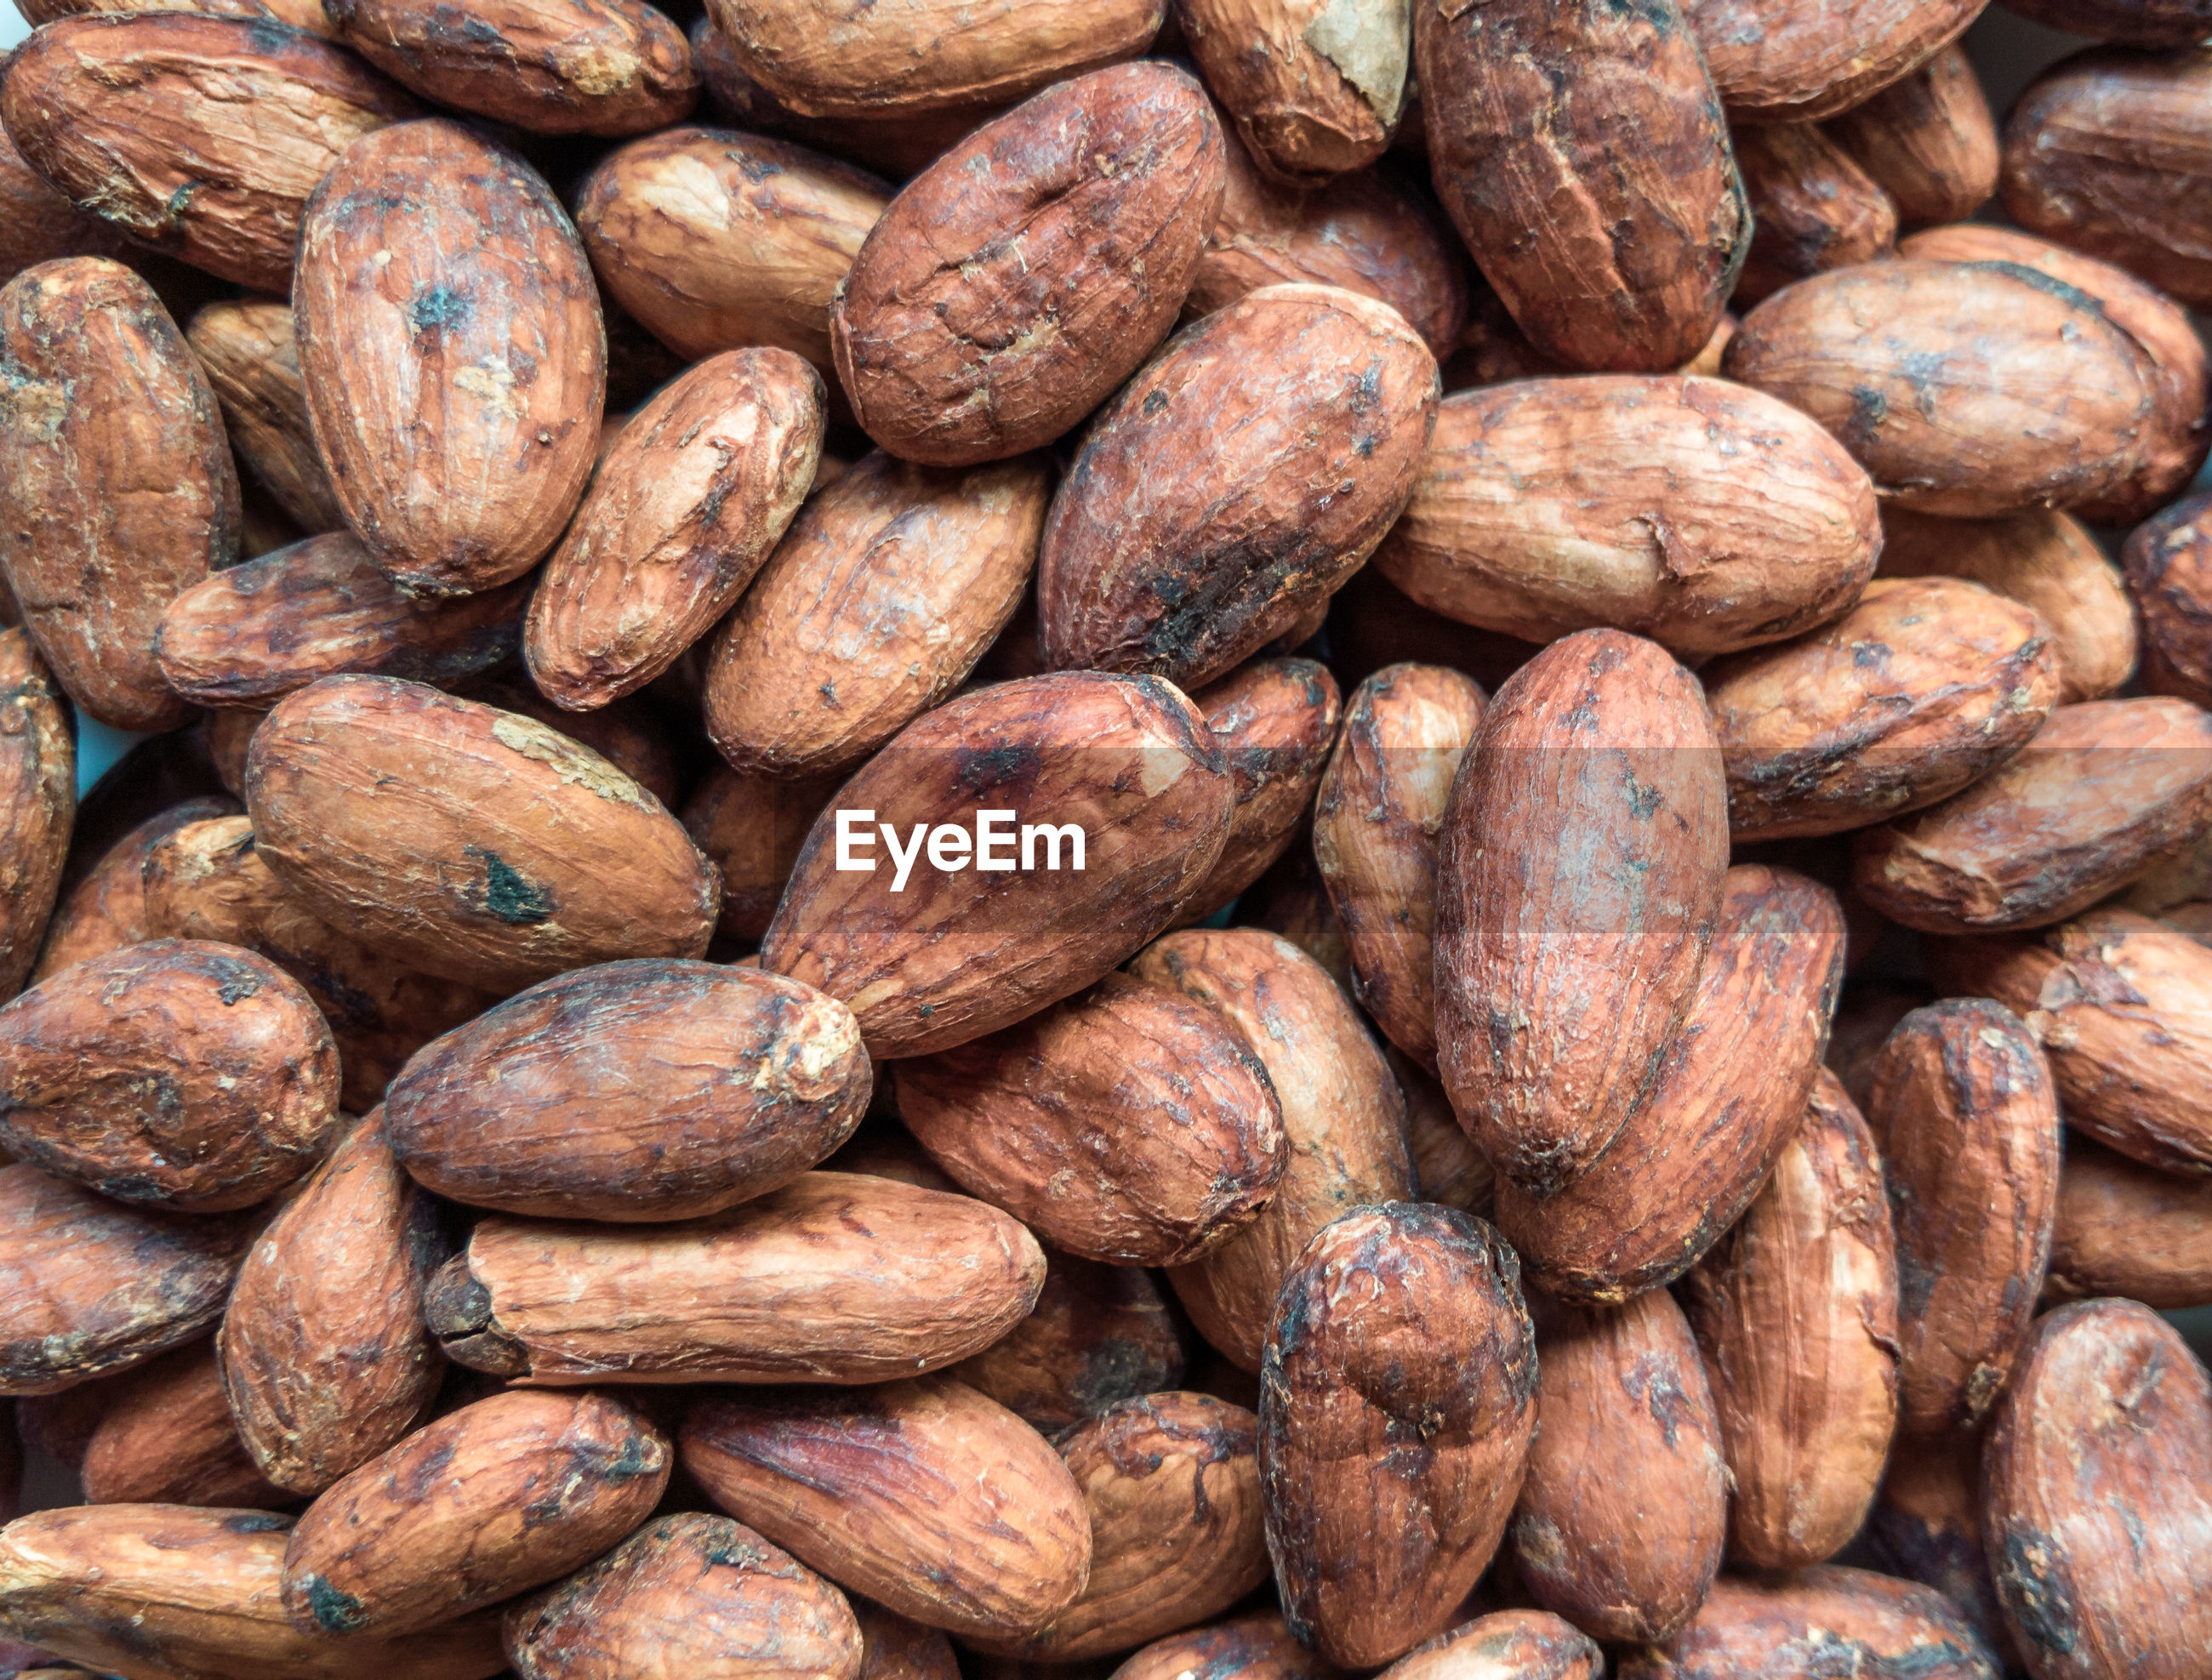 Cacao beans close up